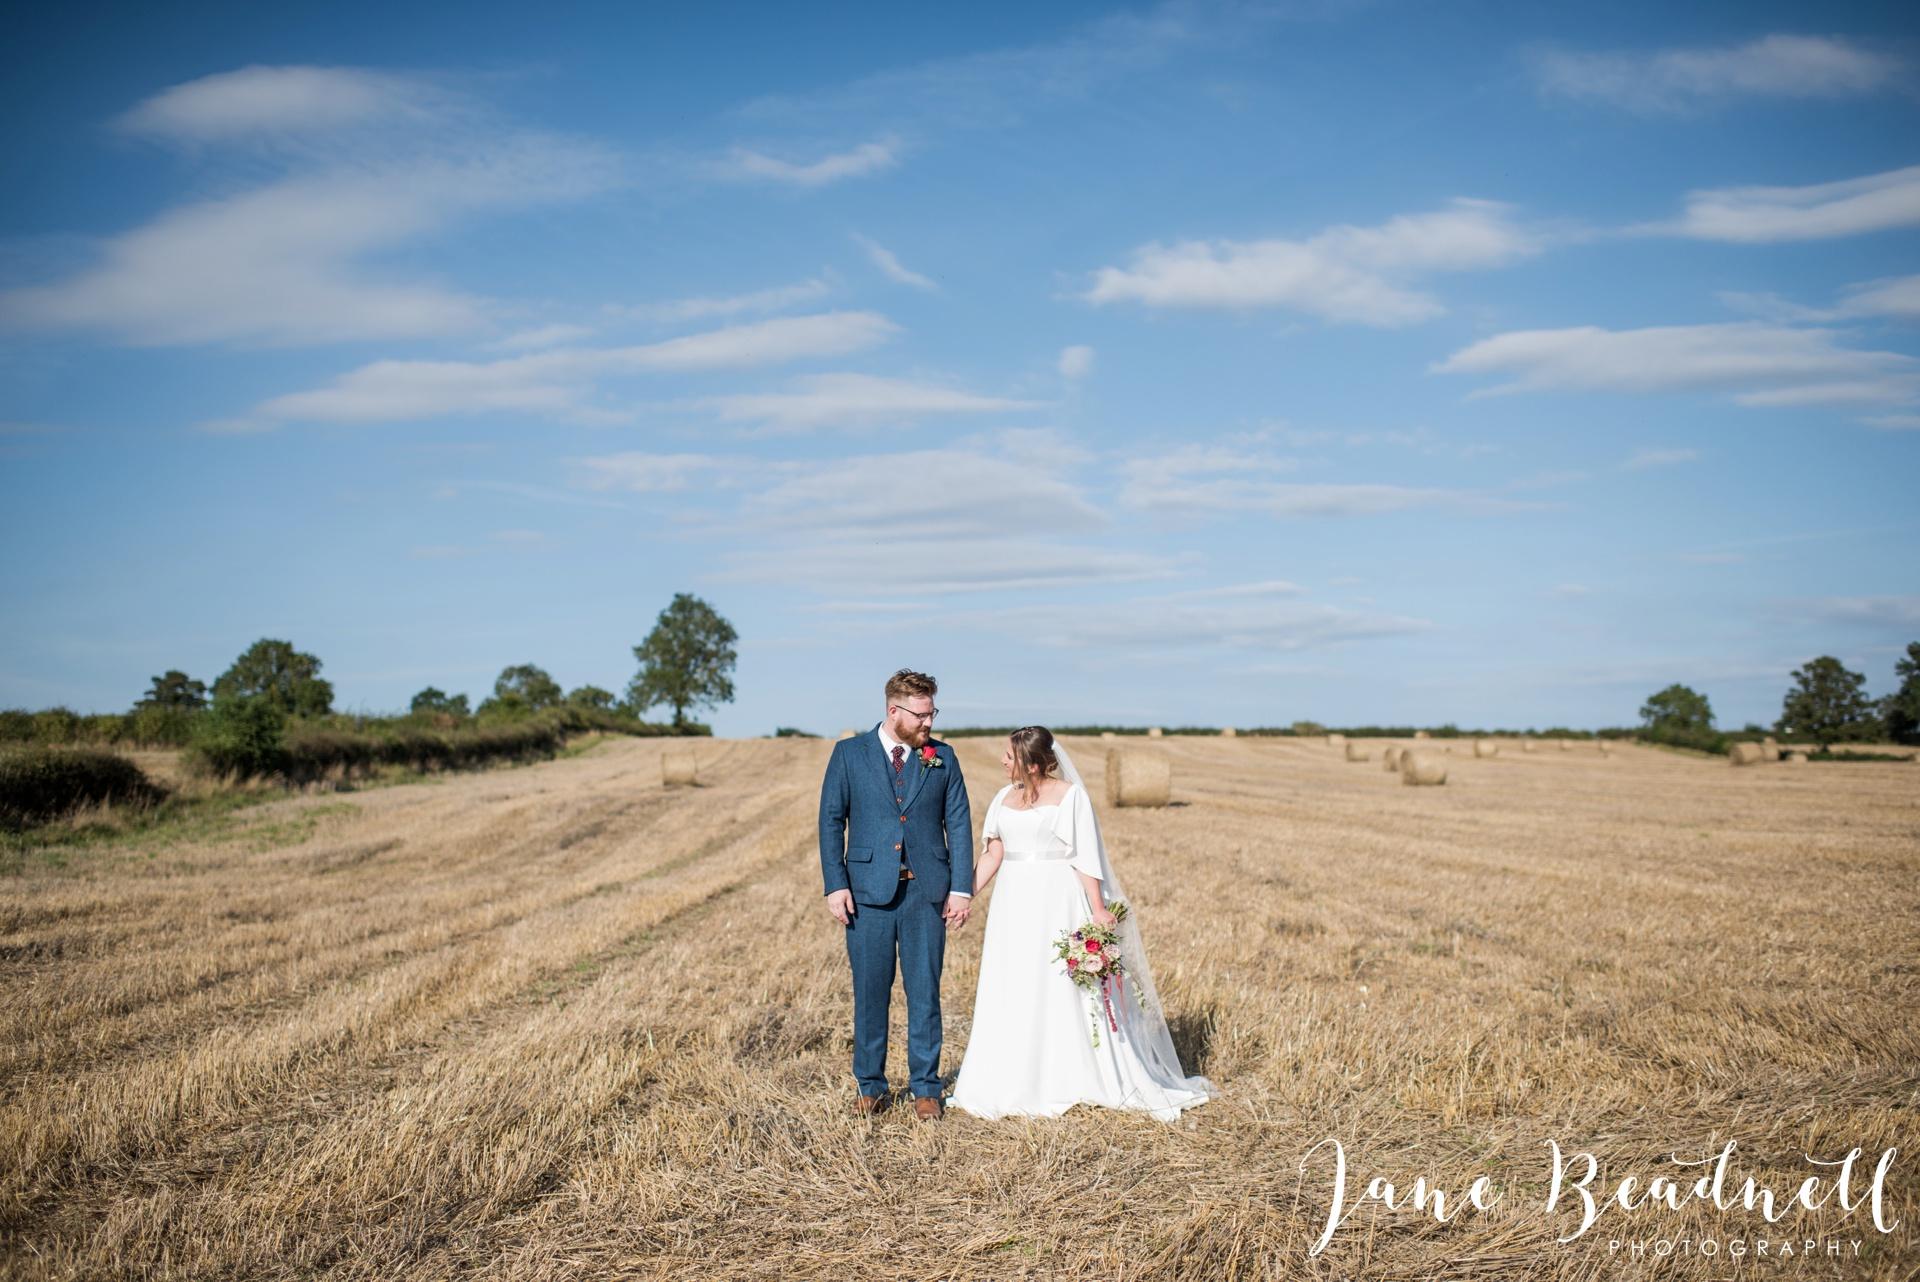 yorkshire-fine-art-wedding-photographer-jane-beadnell-photography_0006